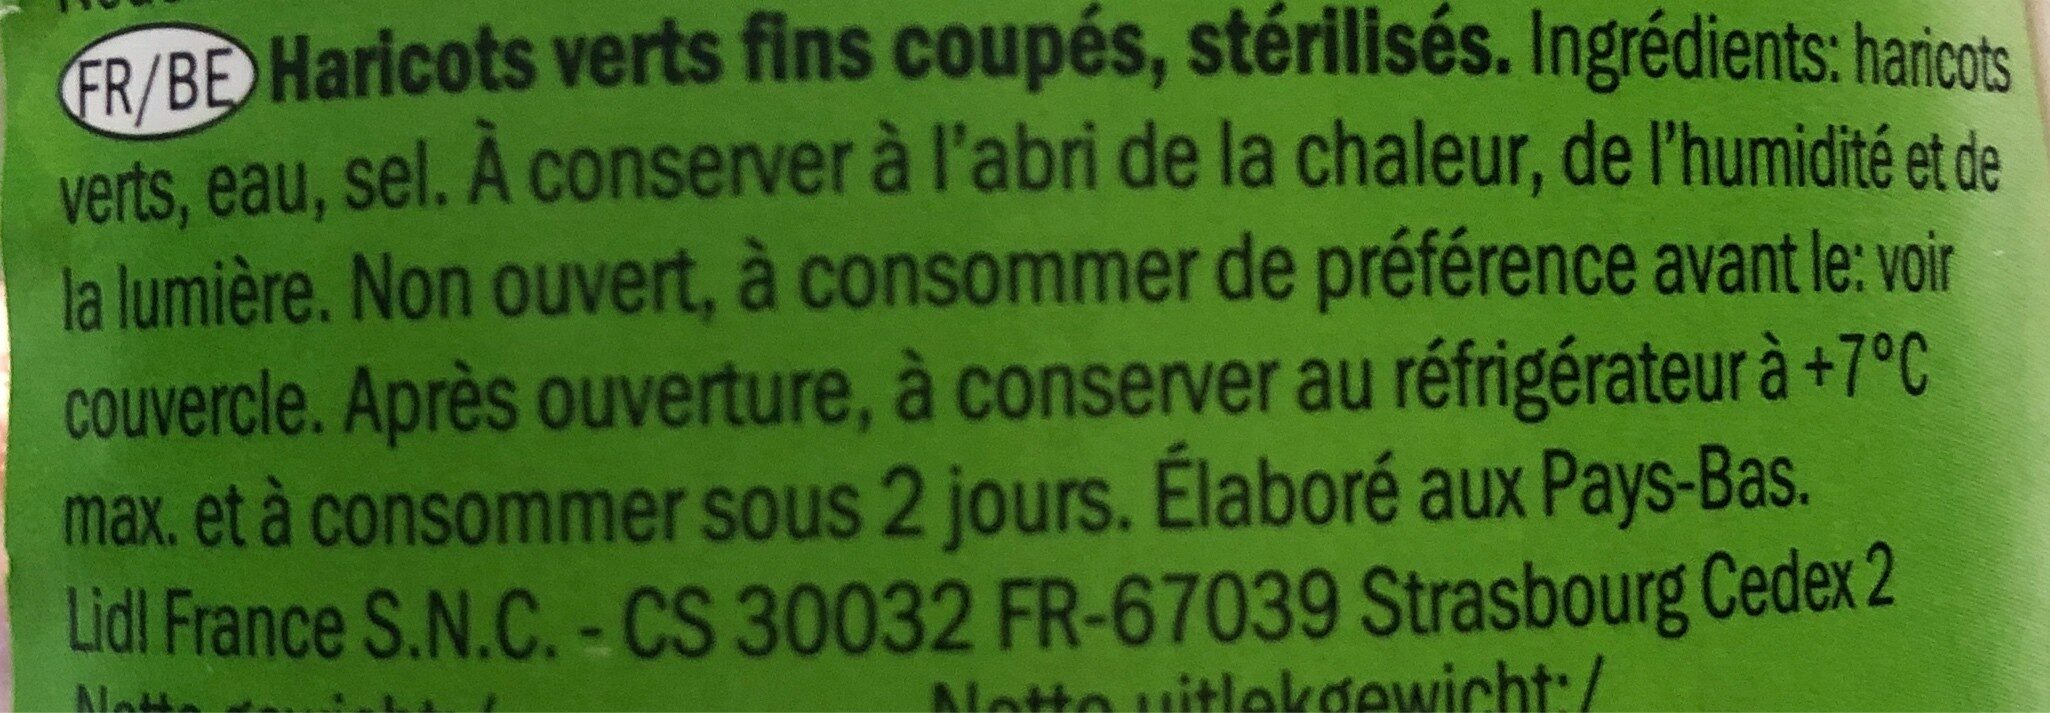 Haricots verts Freshona - Ingrediënten - fr